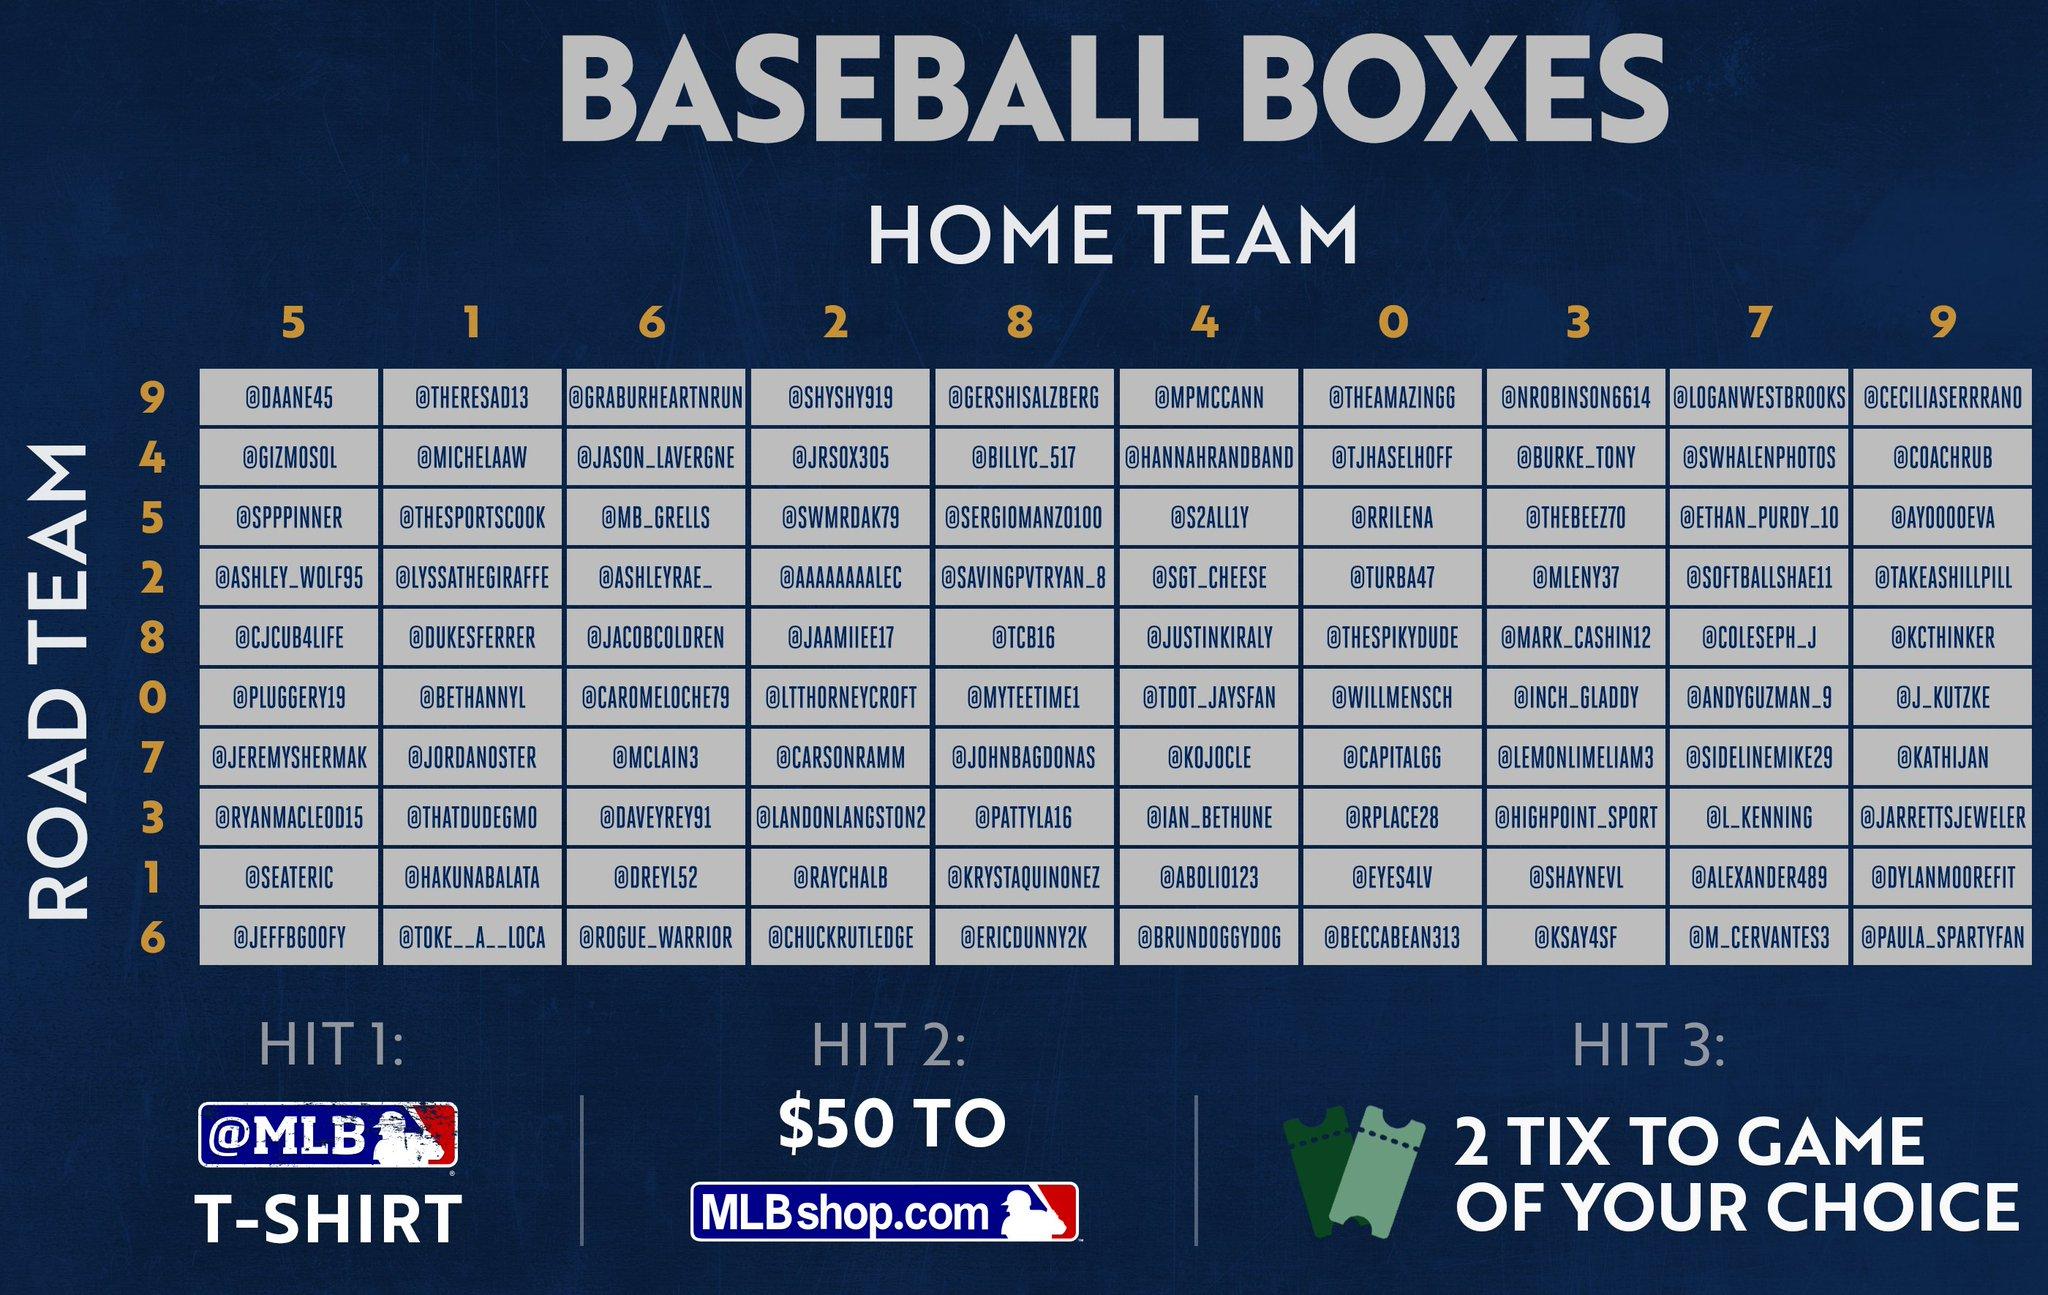 Here. We. Go. #BaseballBoxes https://t.co/2KDsEDp5gA